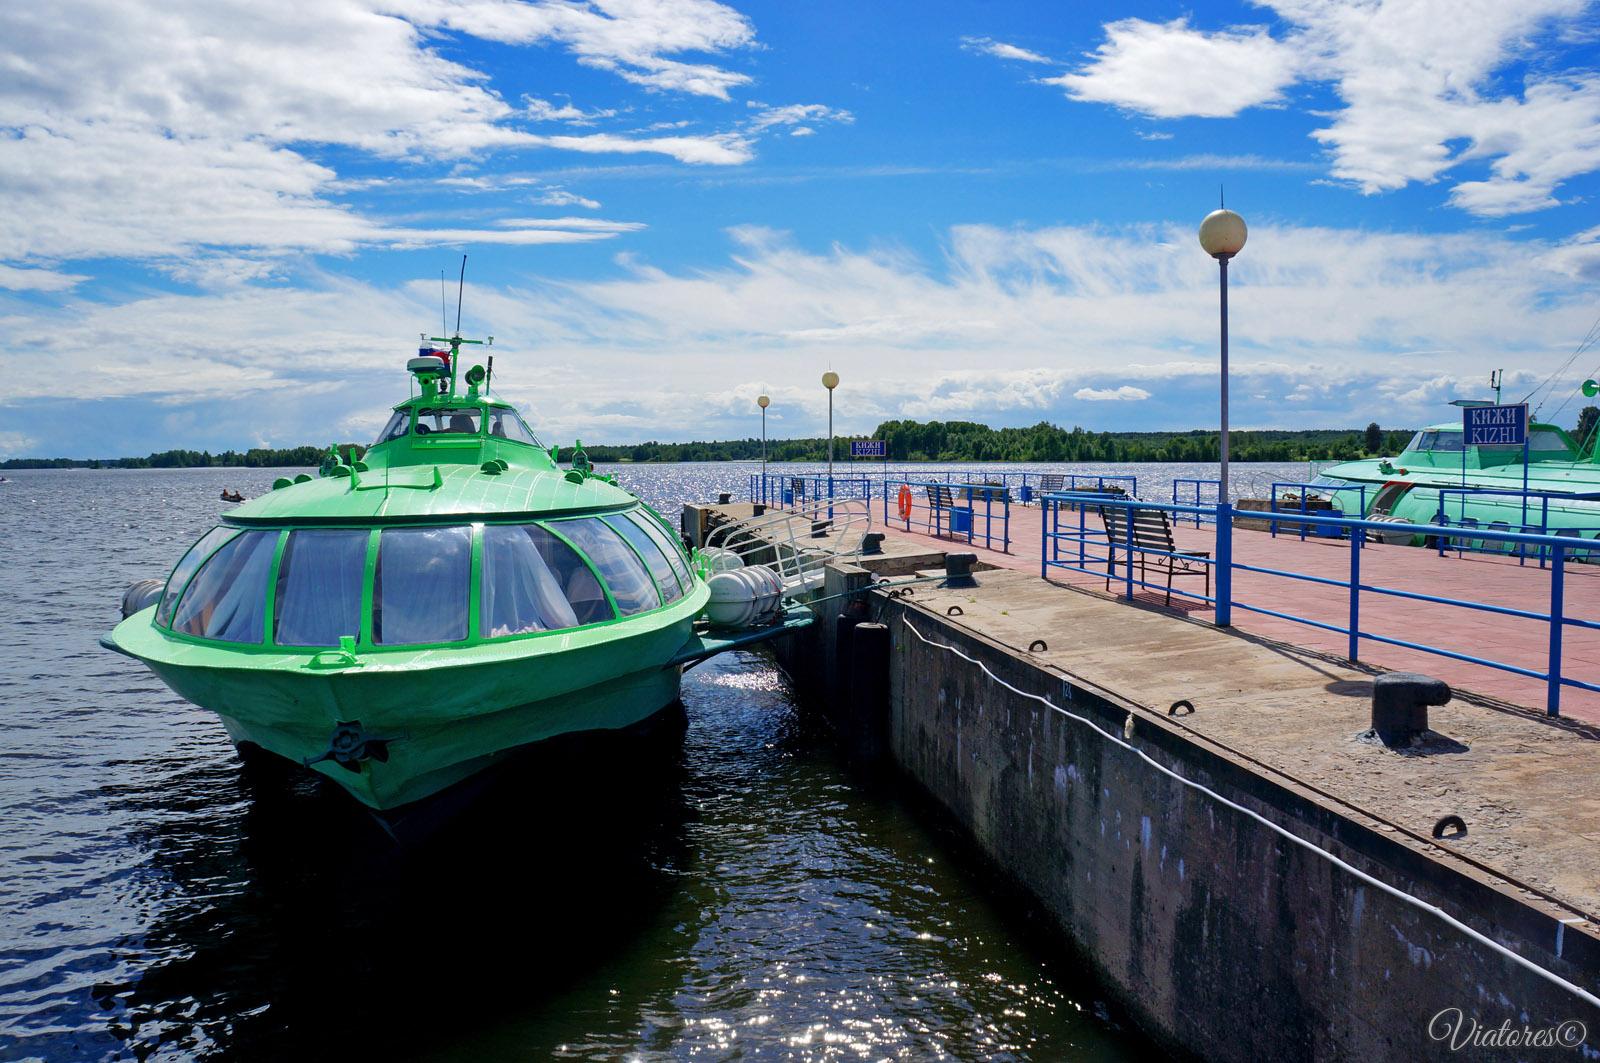 Petrozavodsk Transport